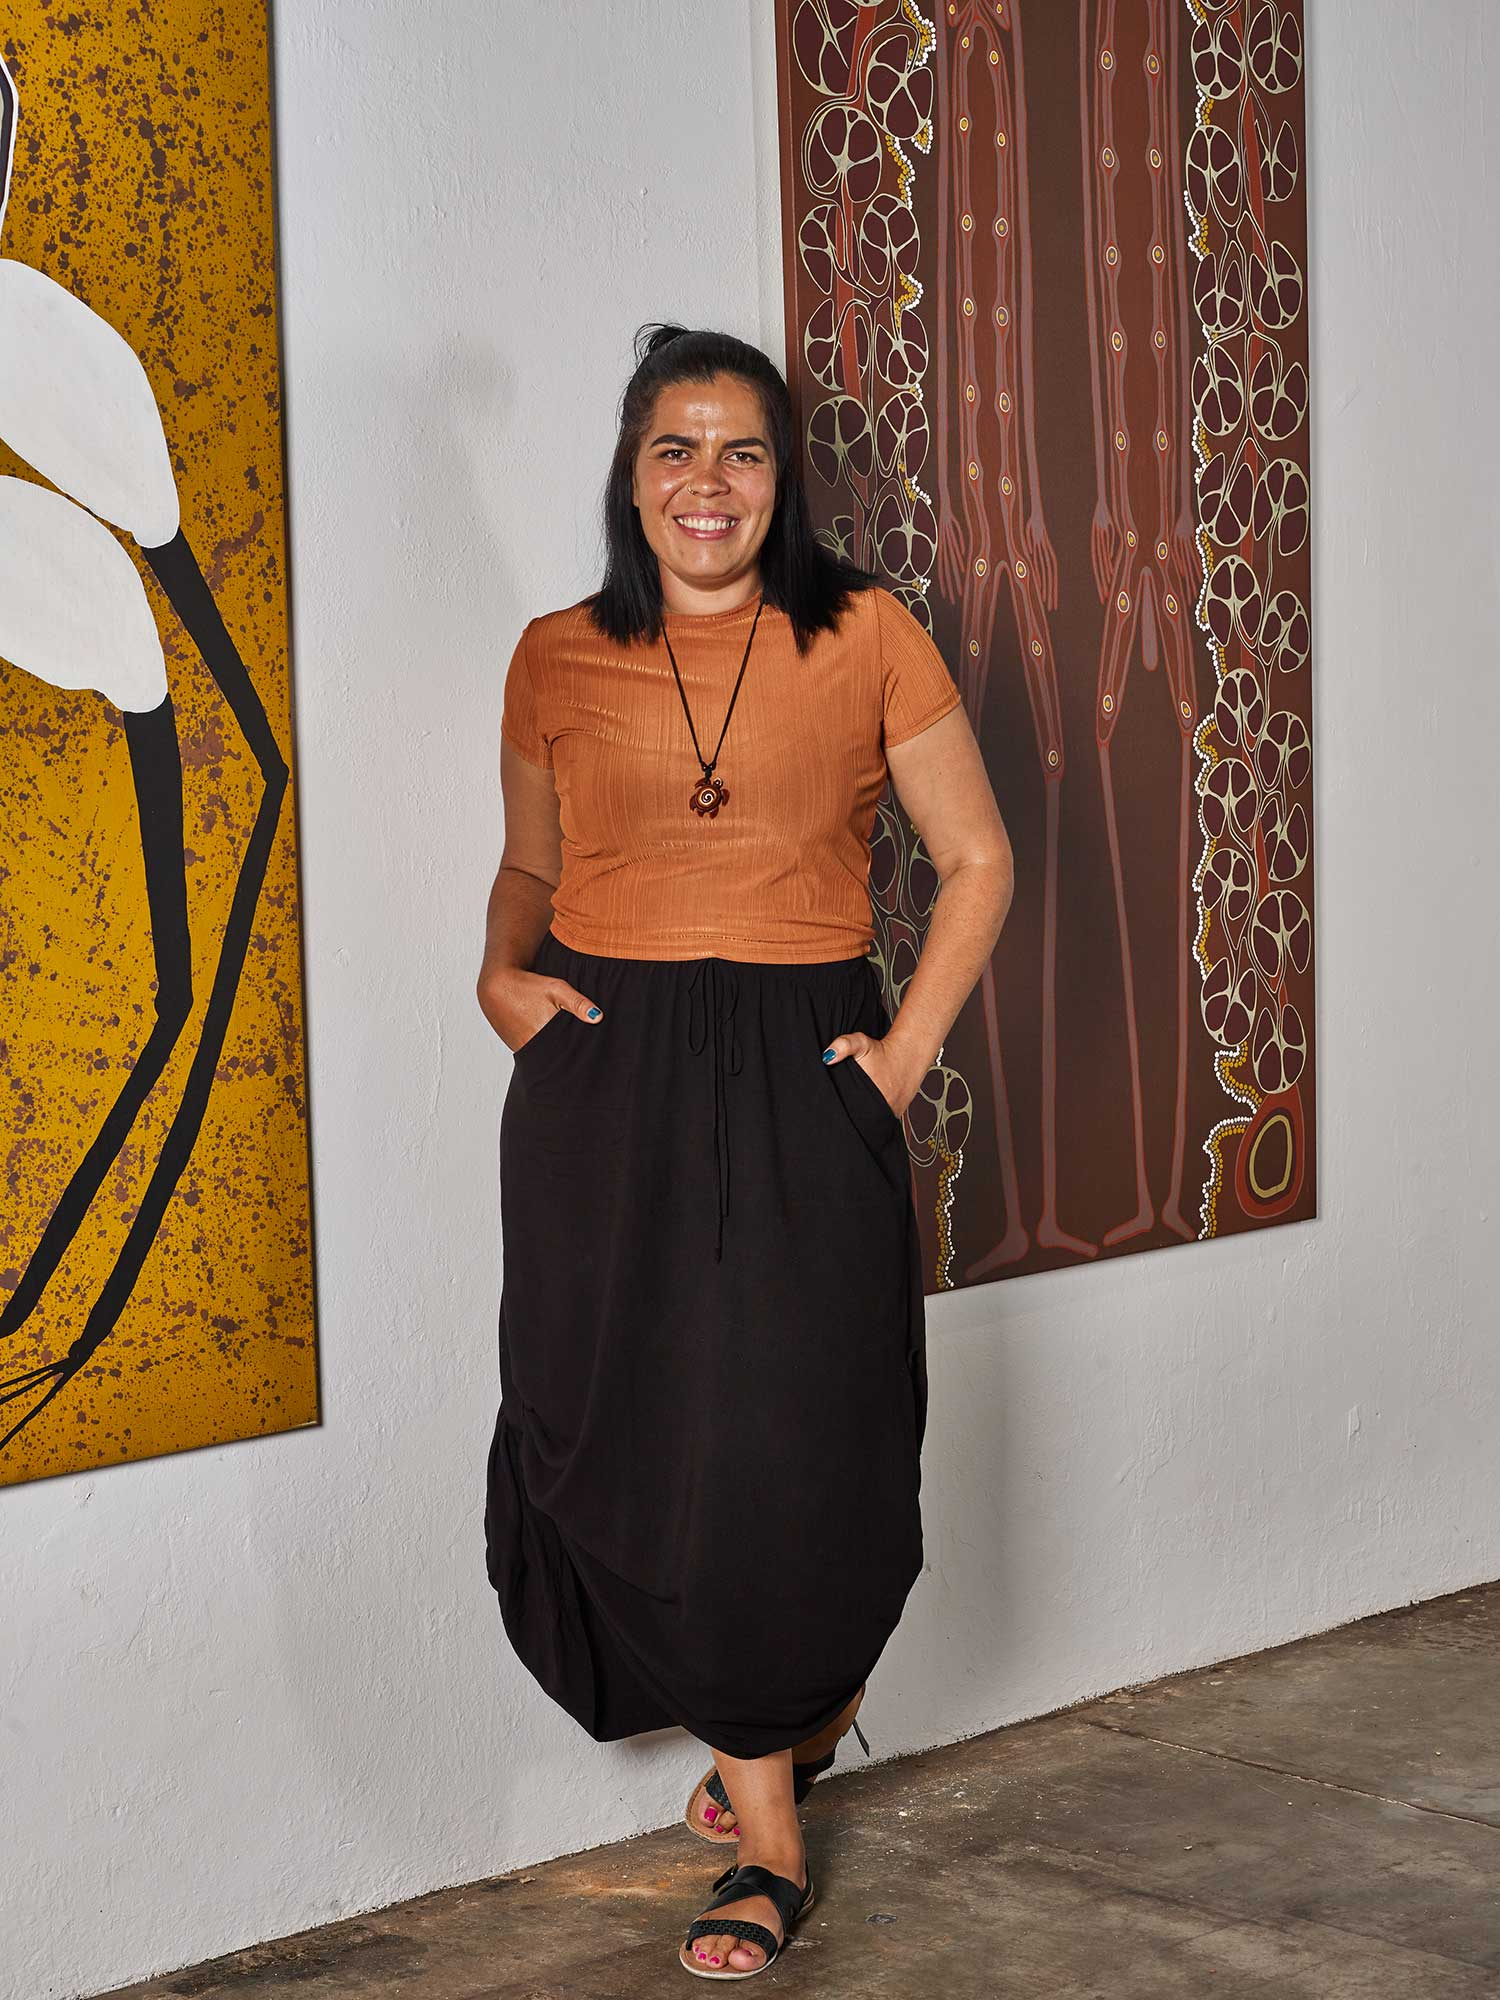 Far North Queensland artist Tarsha Davis